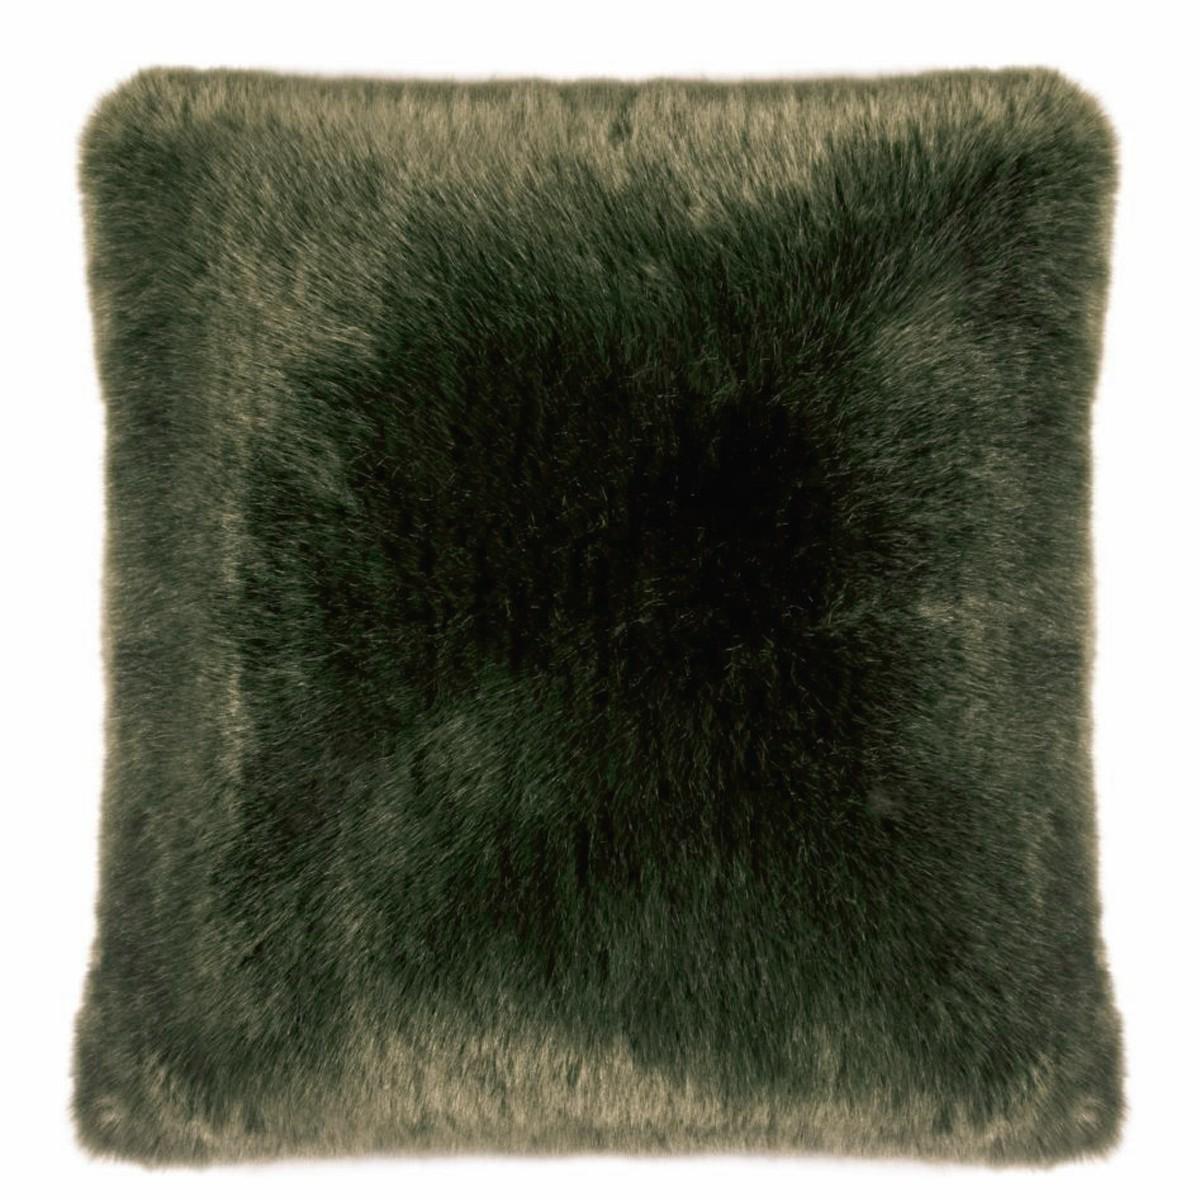 pad kissen sheridan in felloptik olive 45 x 45 cm. Black Bedroom Furniture Sets. Home Design Ideas